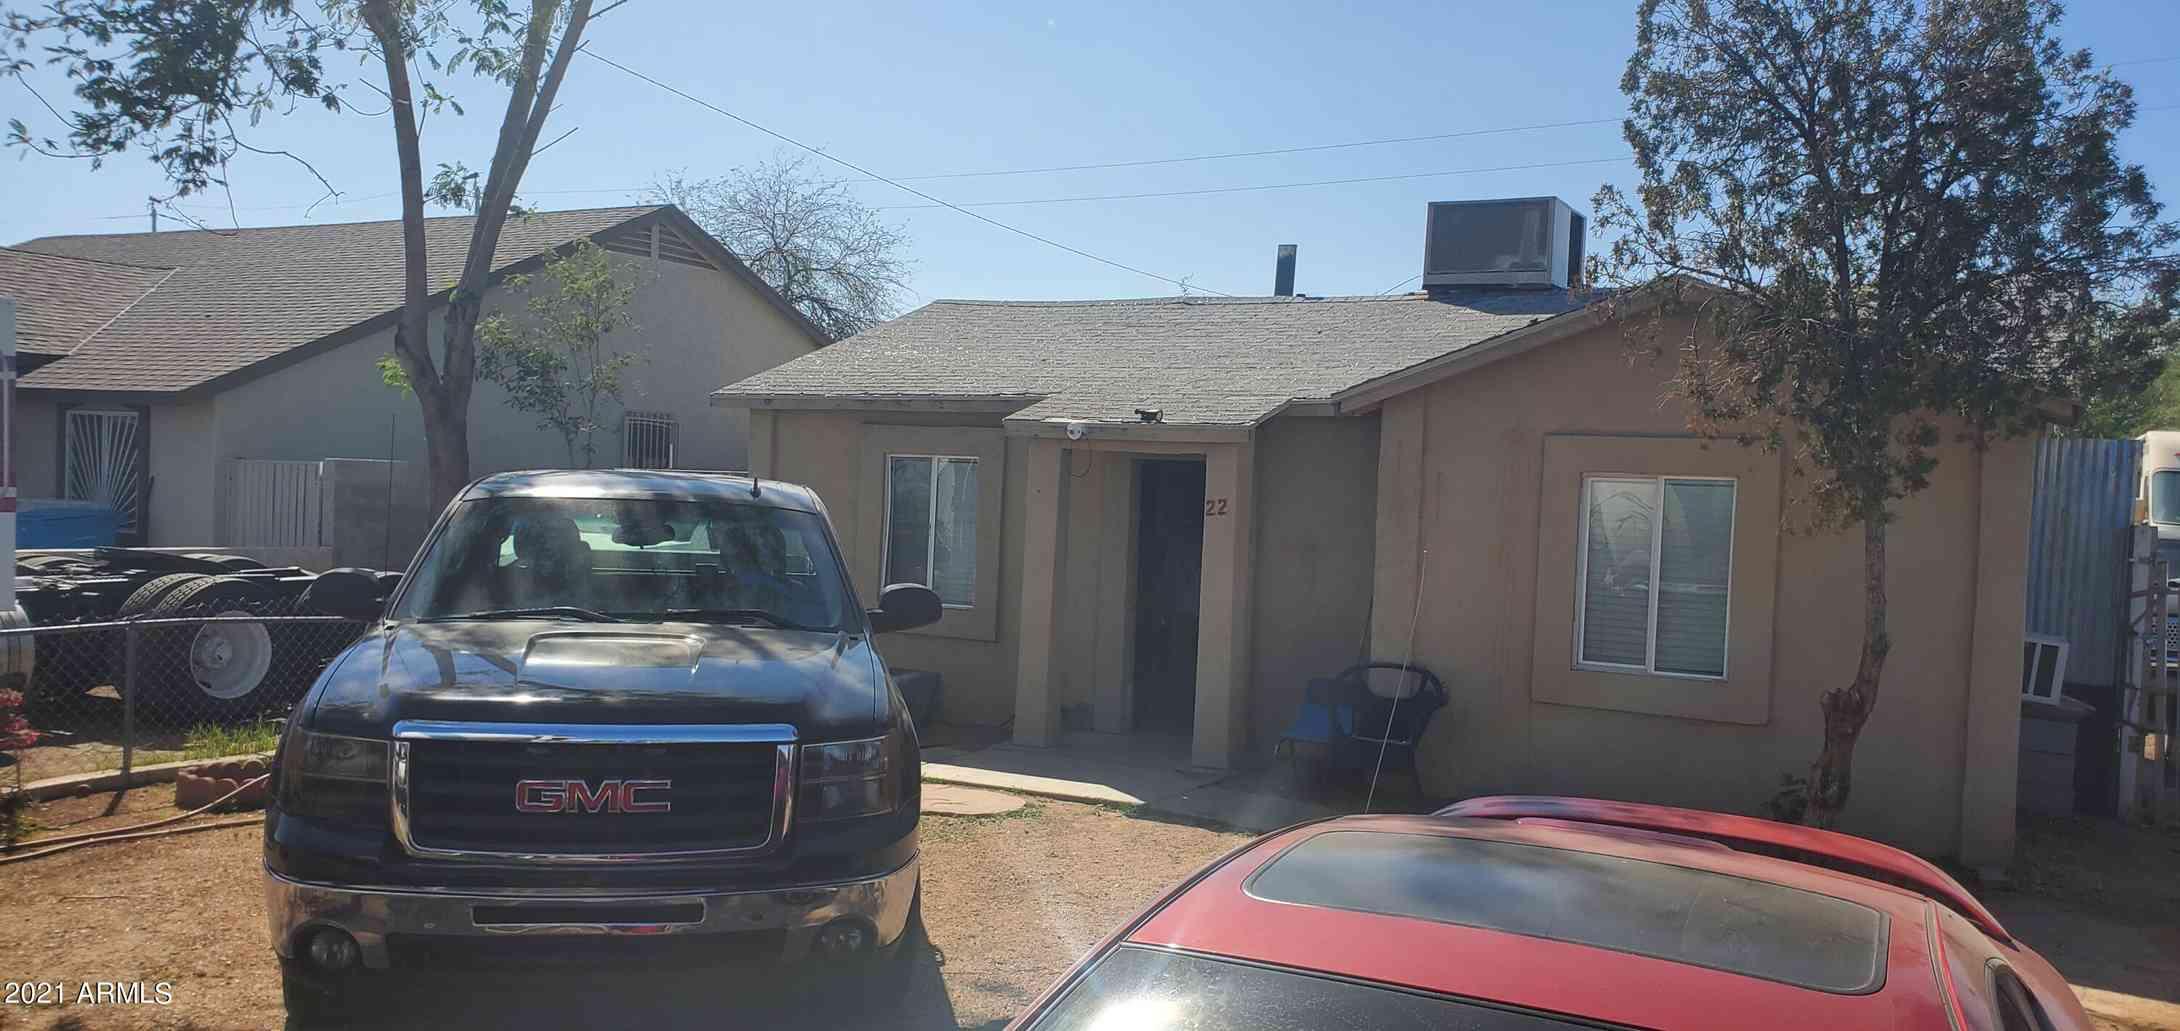 22 S 28TH Avenue, Phoenix, AZ, 85009,